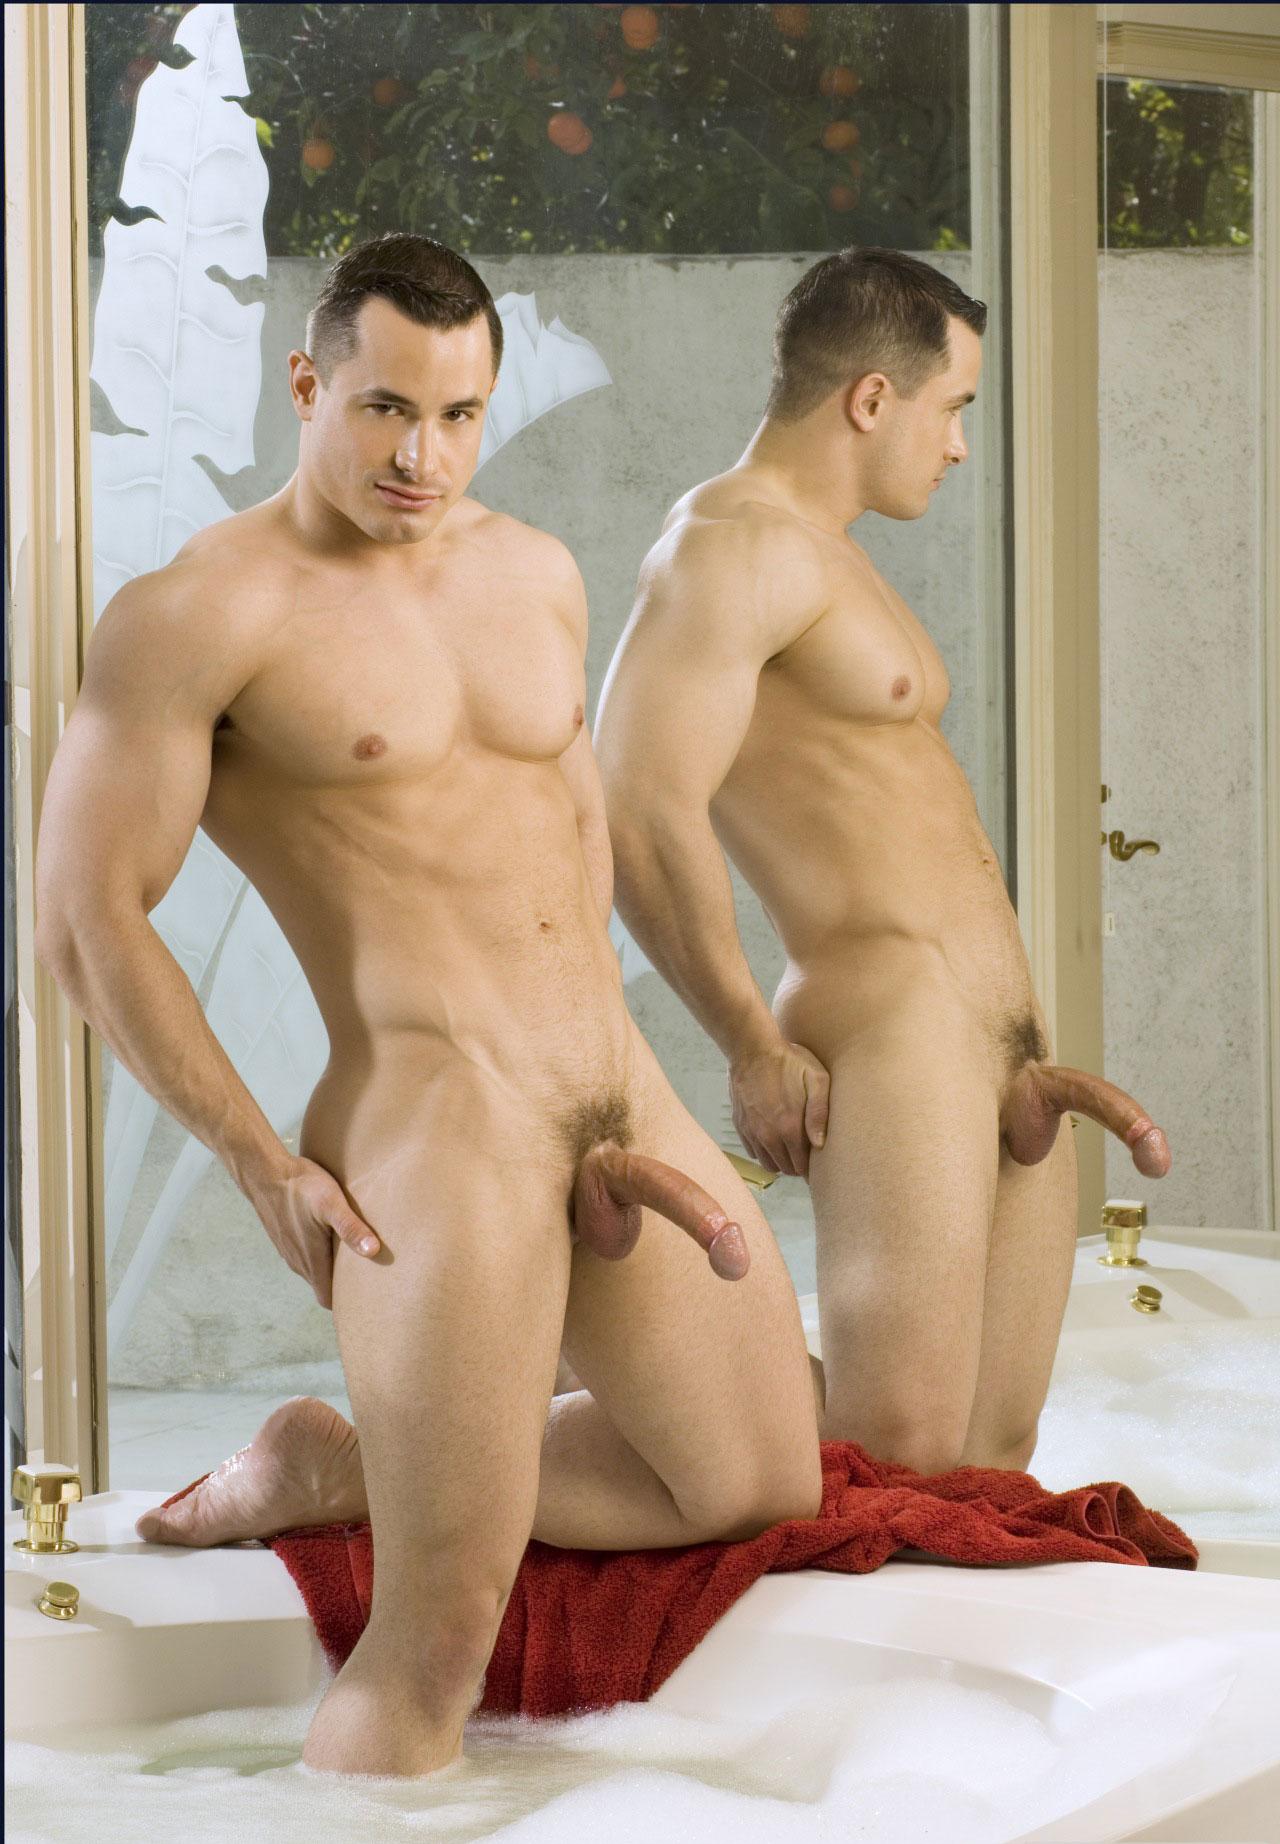 Galerias Fotos Desnudos Tgp Modelos Pornostars Cachas Videos Porno Gay